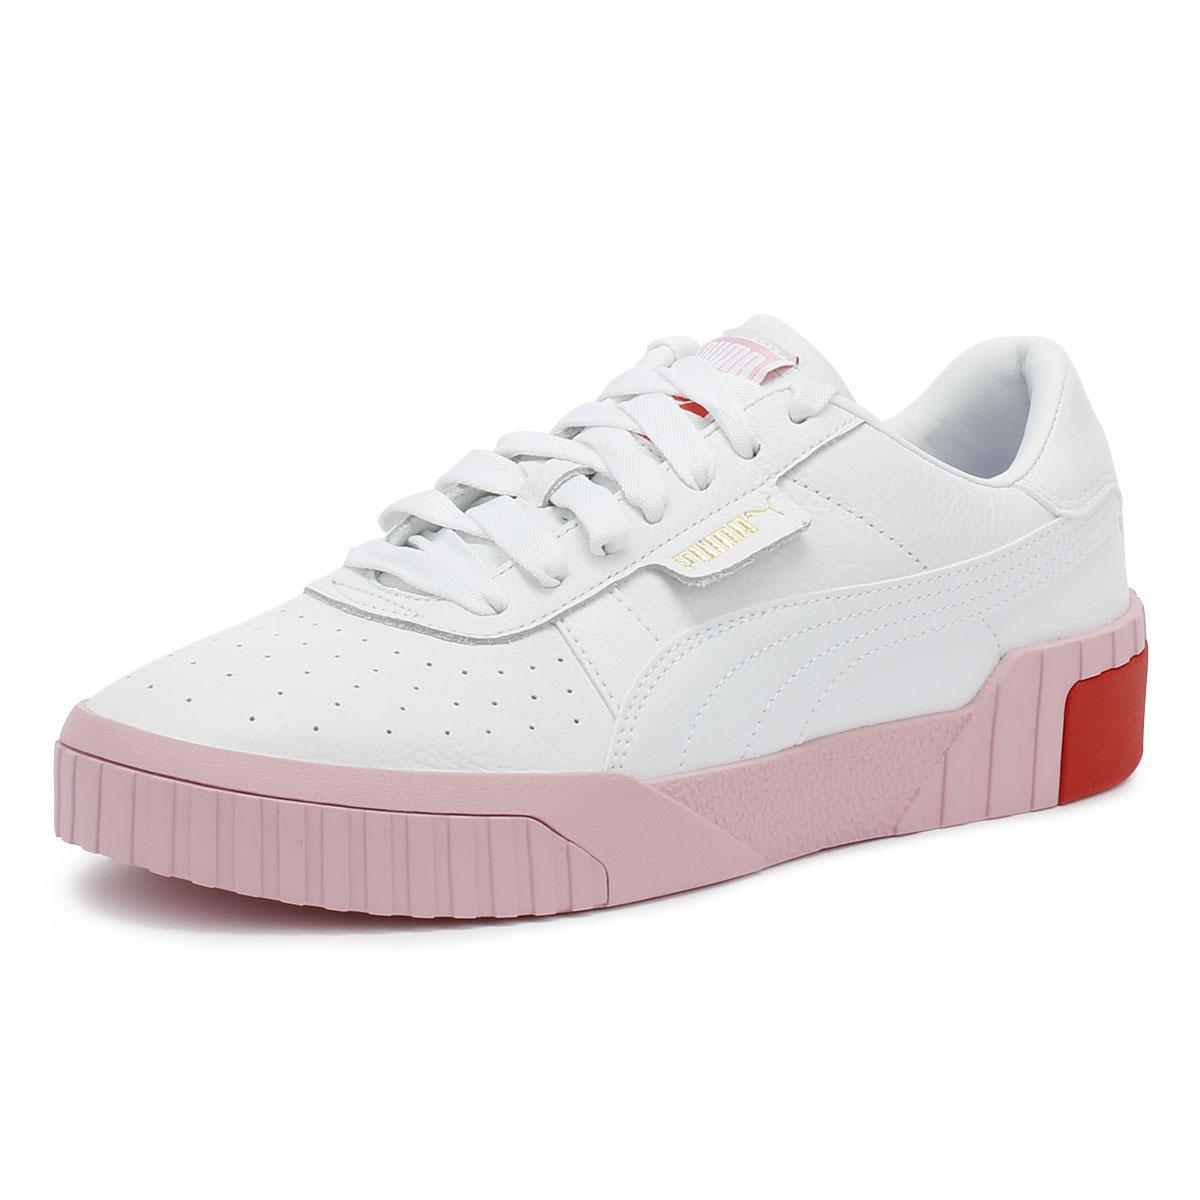 da9d28d8bae5 PUMA - Cali Womens White   Pale Pink Trainers - Lyst. View fullscreen